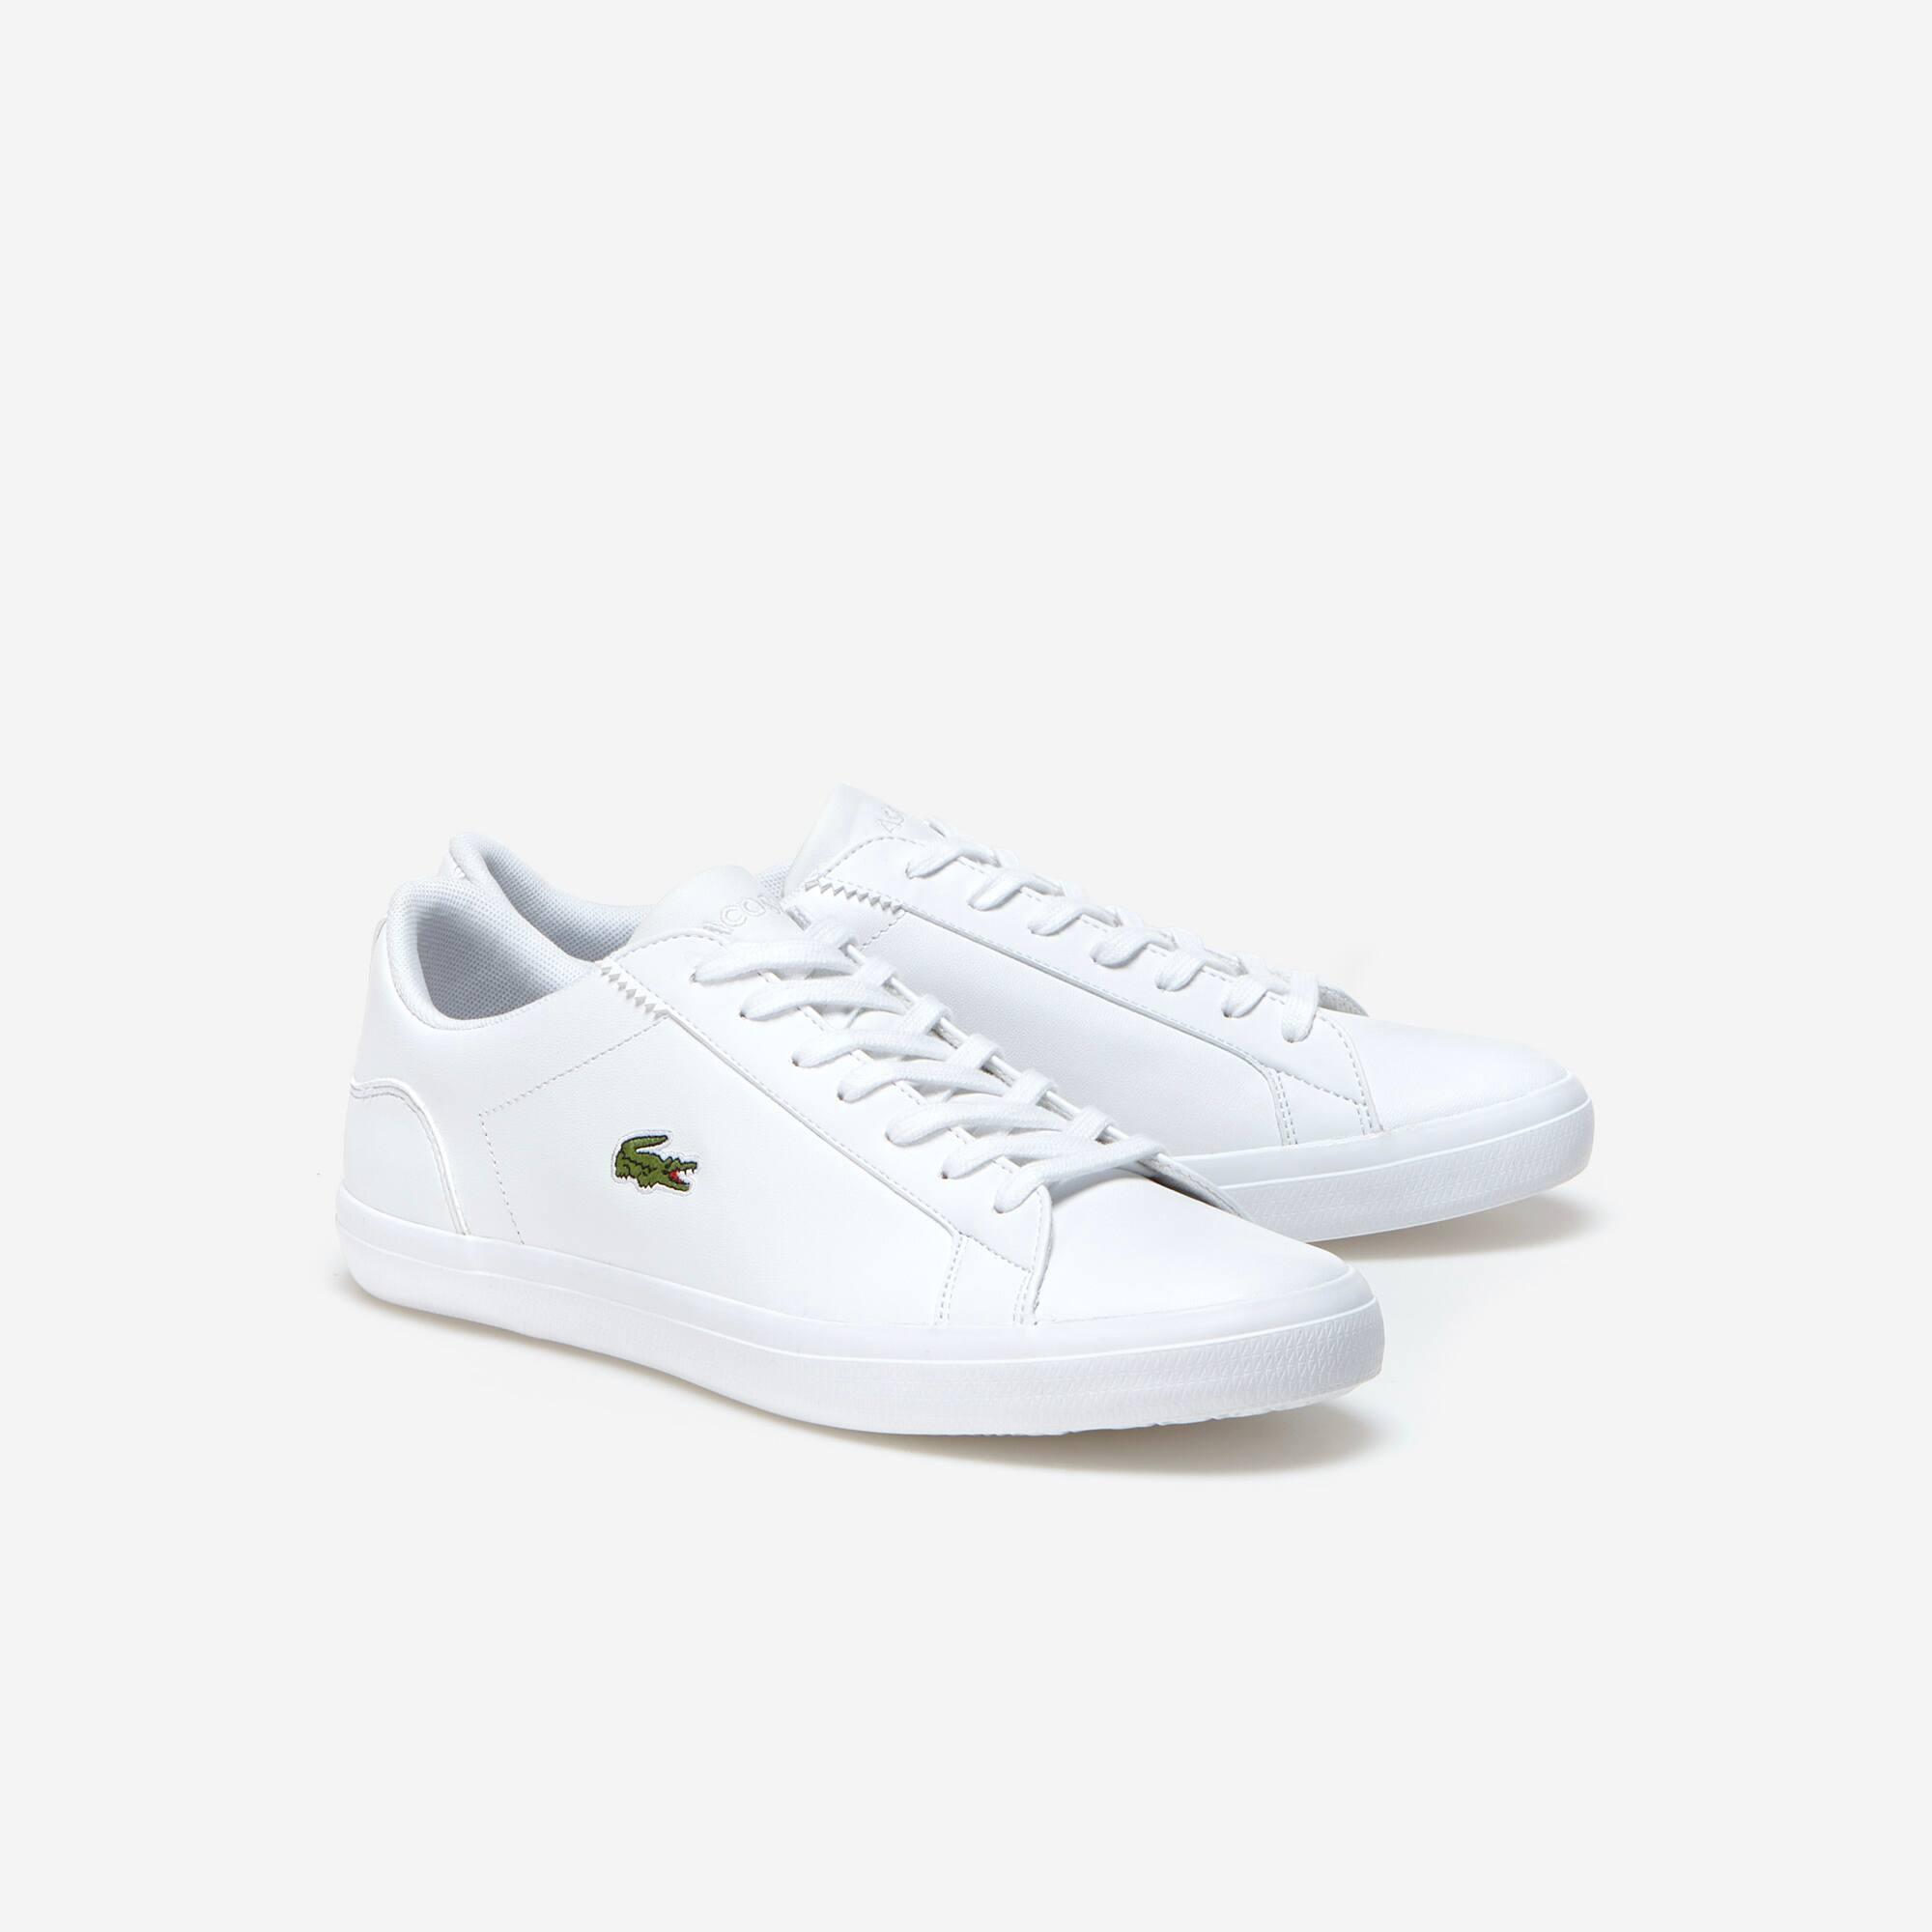 Lacoste - Herren-Sneakers LEROND aus einfarbigem Leder - 2